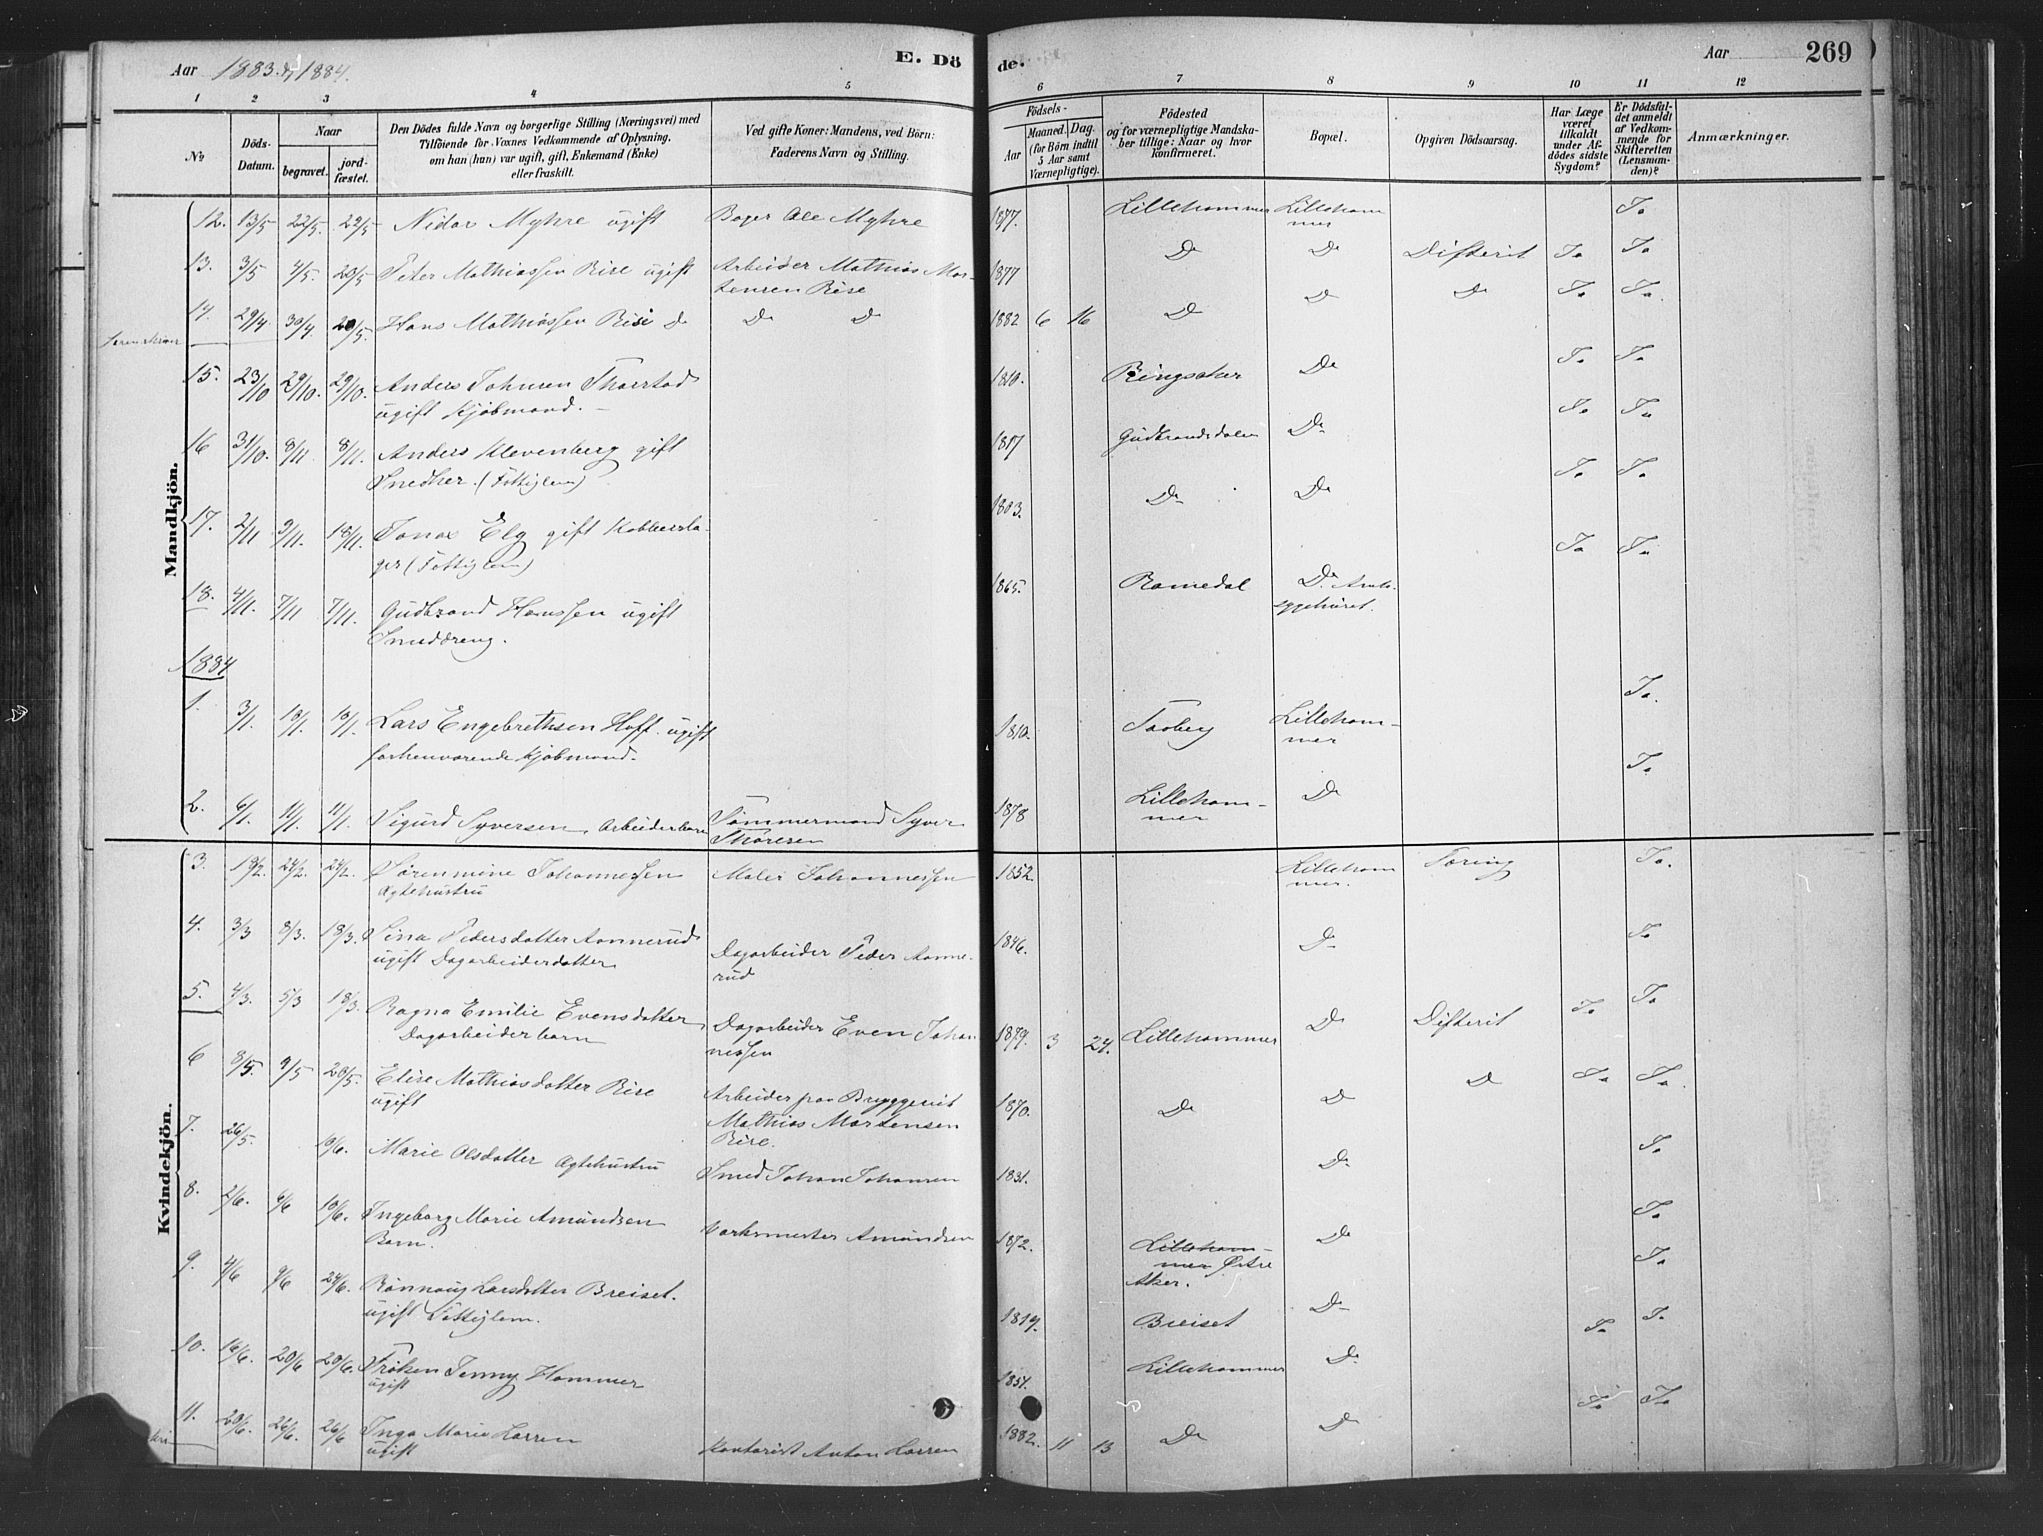 SAH, Fåberg prestekontor, H/Ha/Haa/L0010: Parish register (official) no. 10, 1879-1900, p. 269